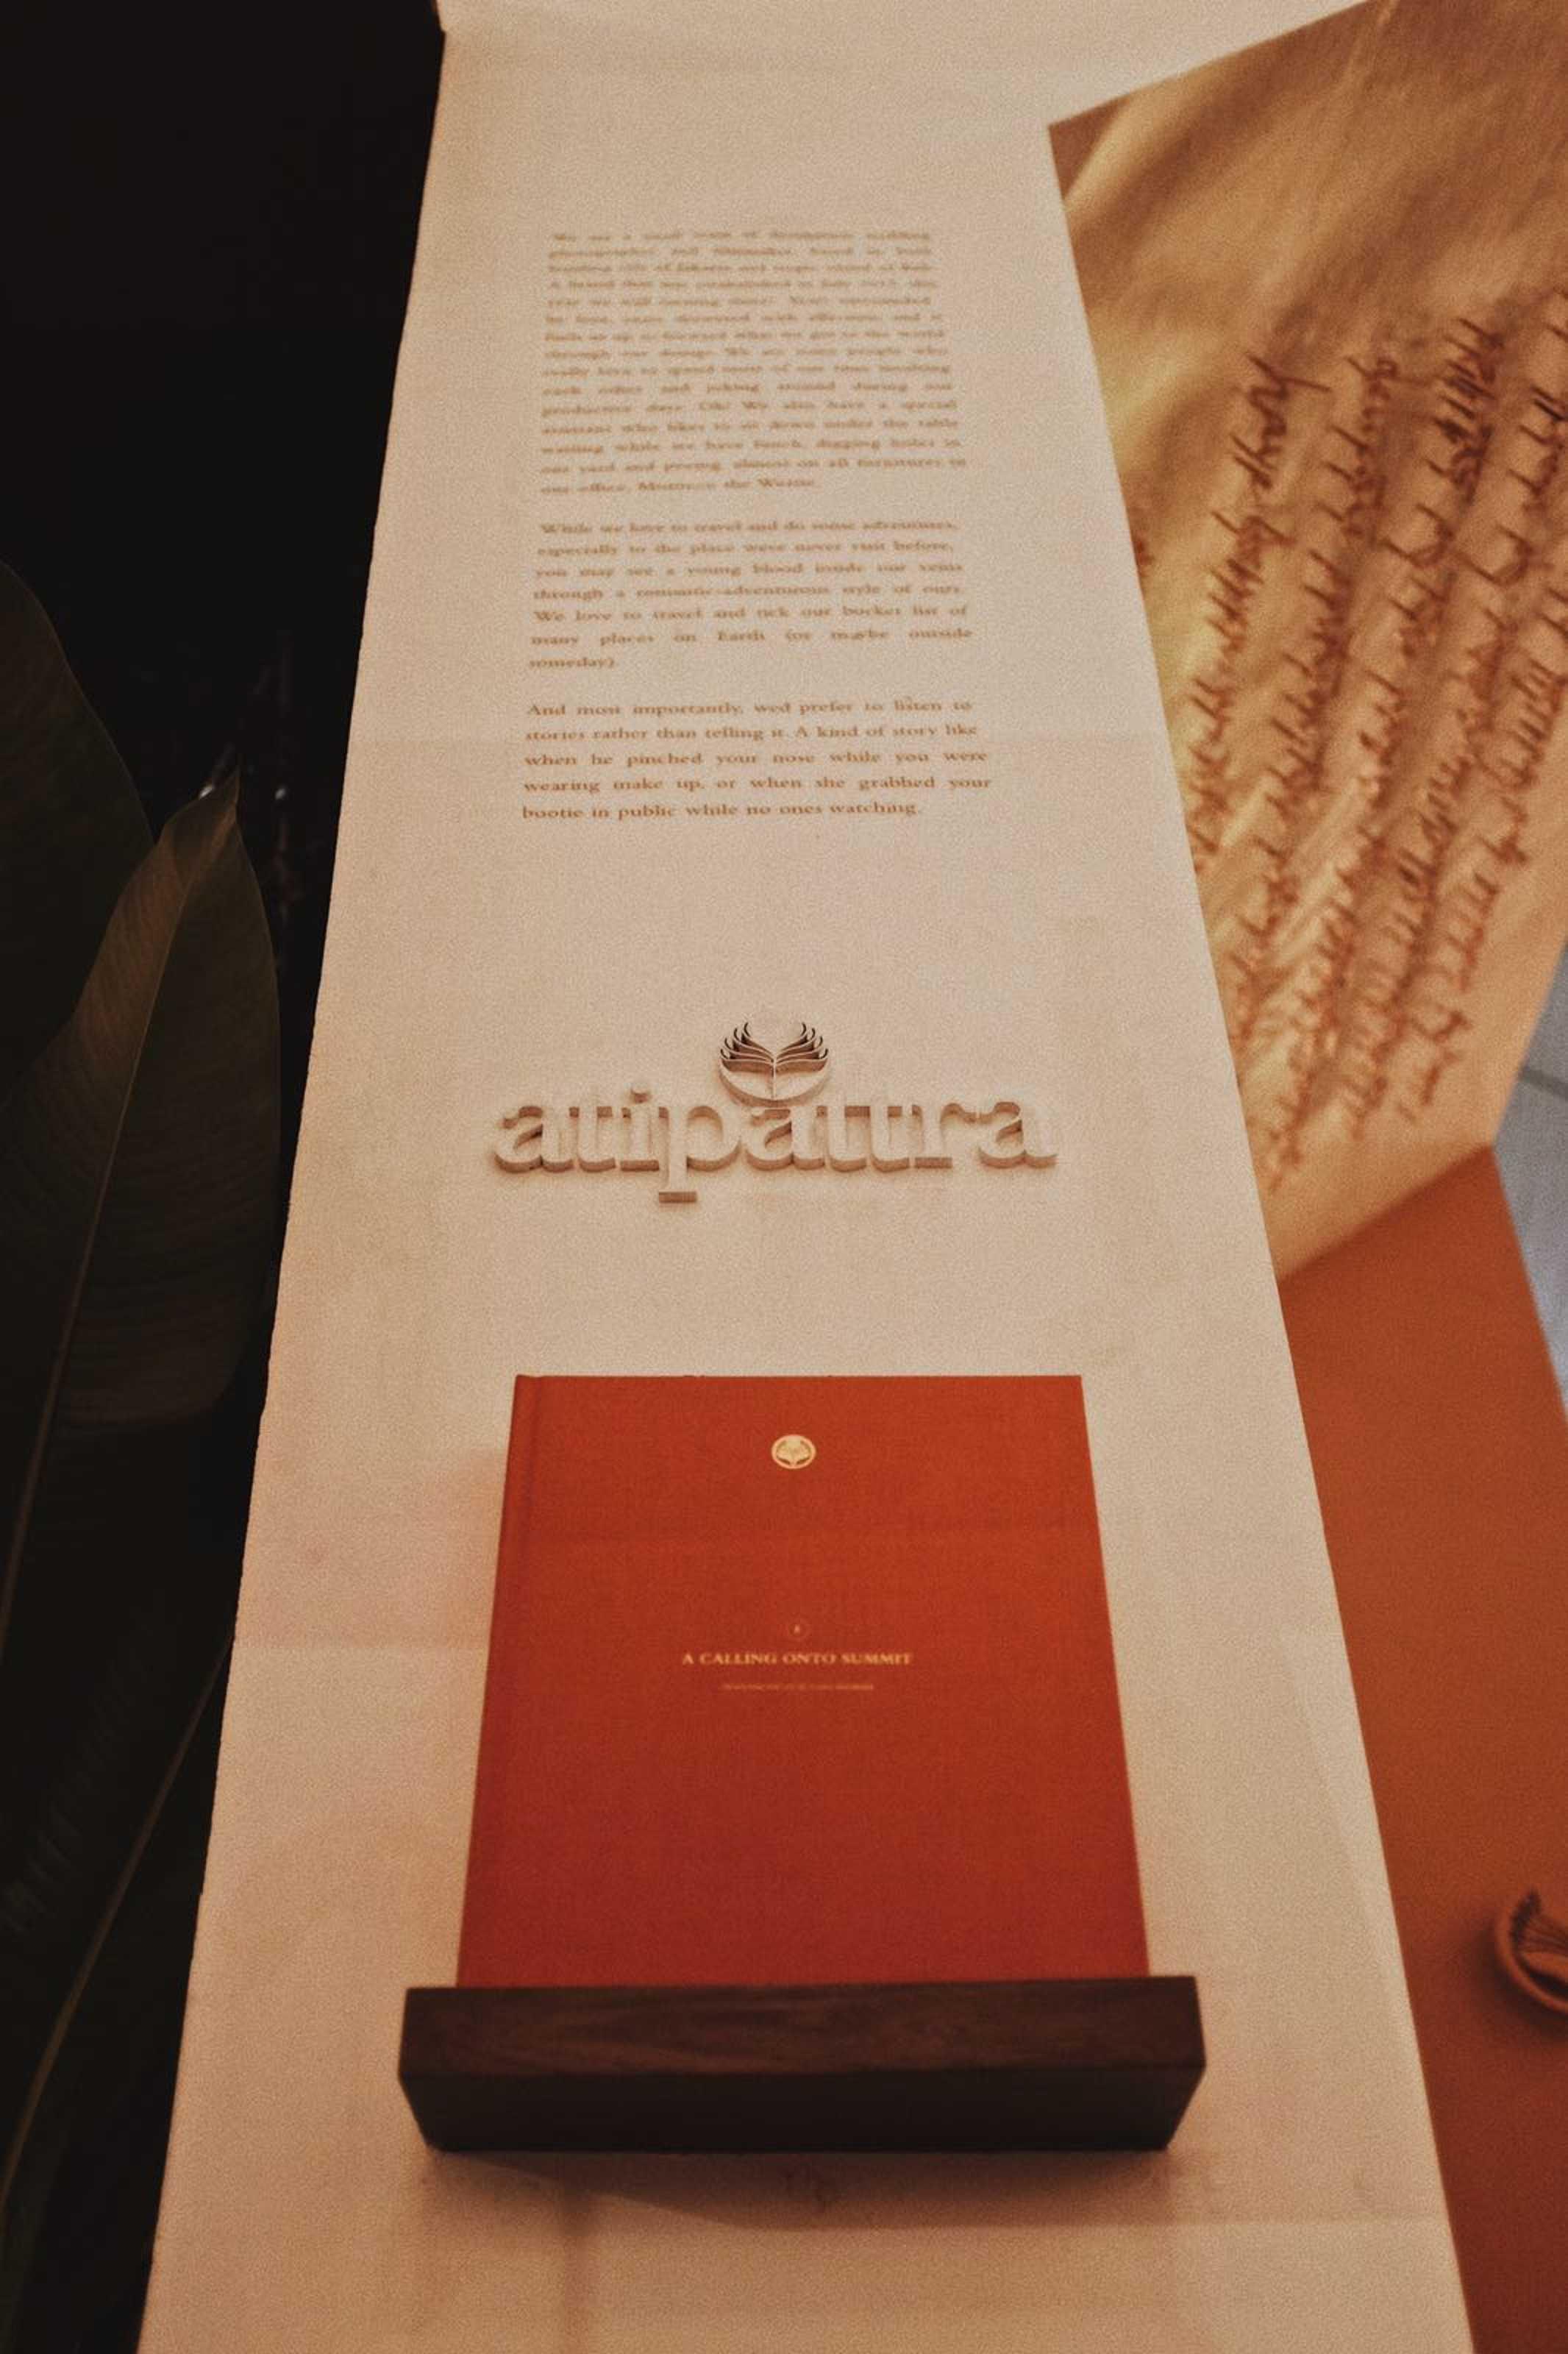 Arcon - Interior & Furniture Contractor Atipattra Booth Jl. Bsd Grand Boulevard No.1, Pagedangan, Tangerang, Banten 15339, Indonesia Jl. Bsd Grand Boulevard No.1, Pagedangan, Tangerang, Banten 15339, Indonesia Arcon-Interior-Furniture-Contractor-Atipattra-Booth   69895